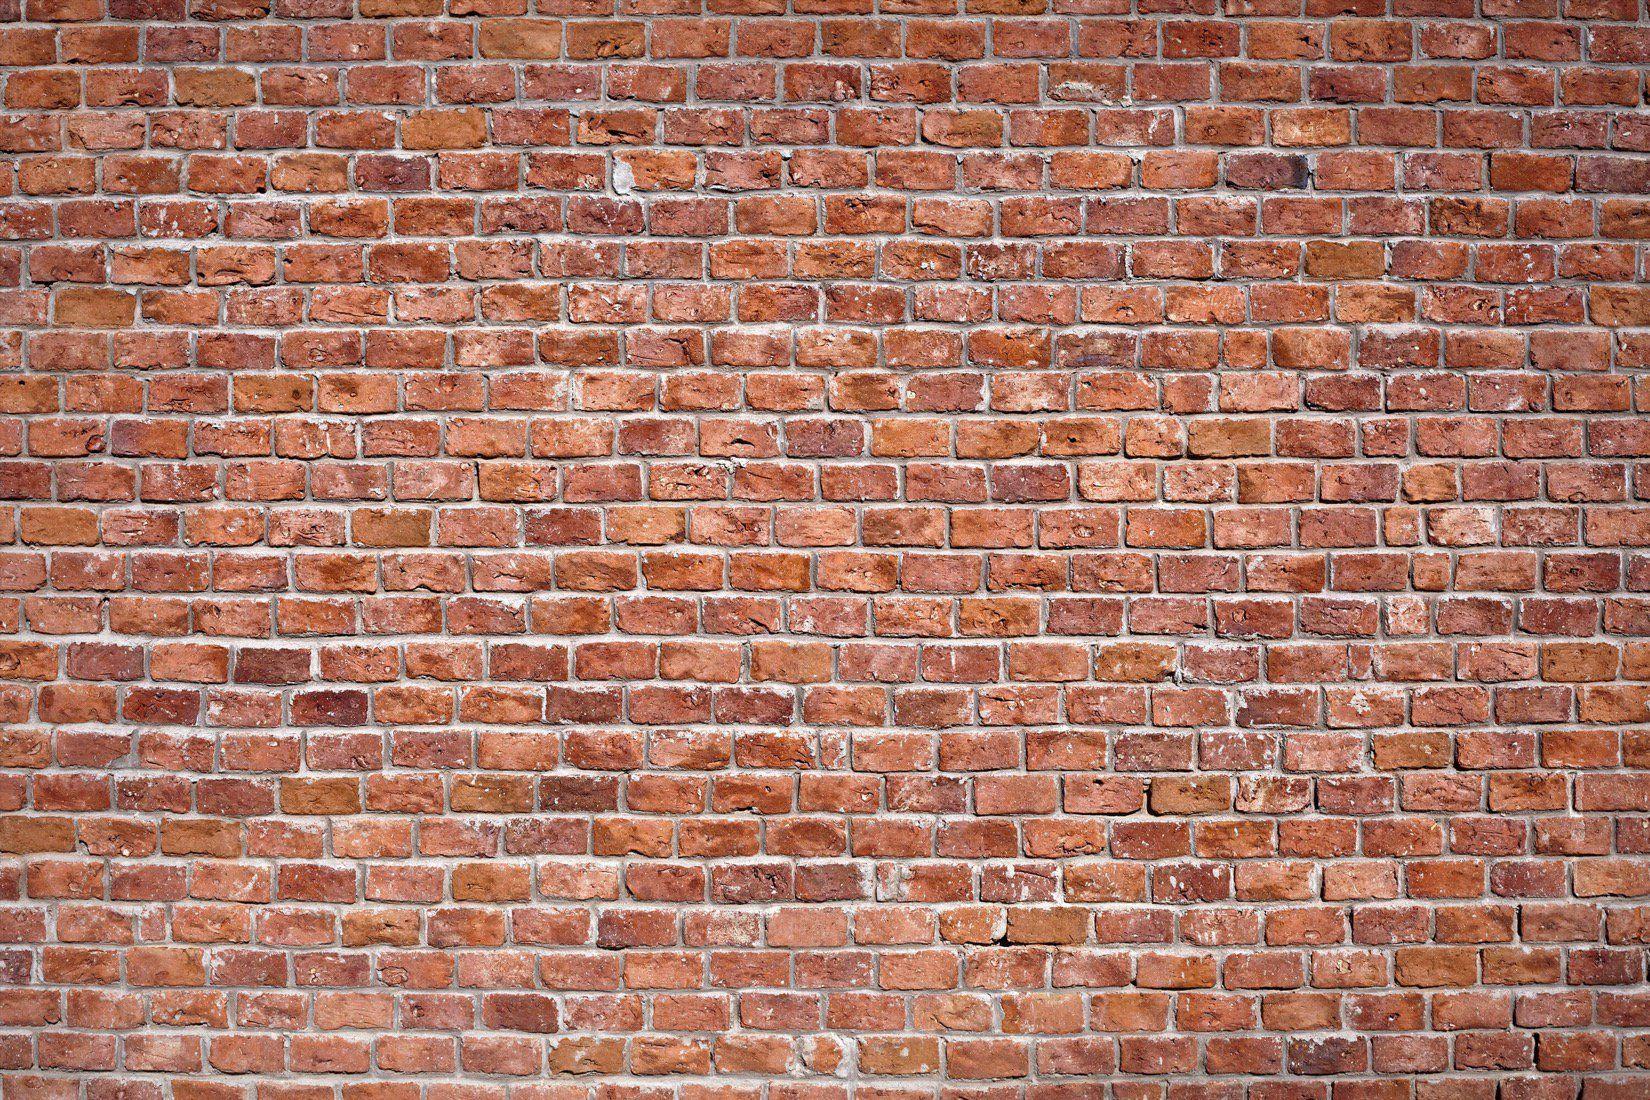 Rundown Red Brick Wall Wallpaper Mural in 2020 Brick